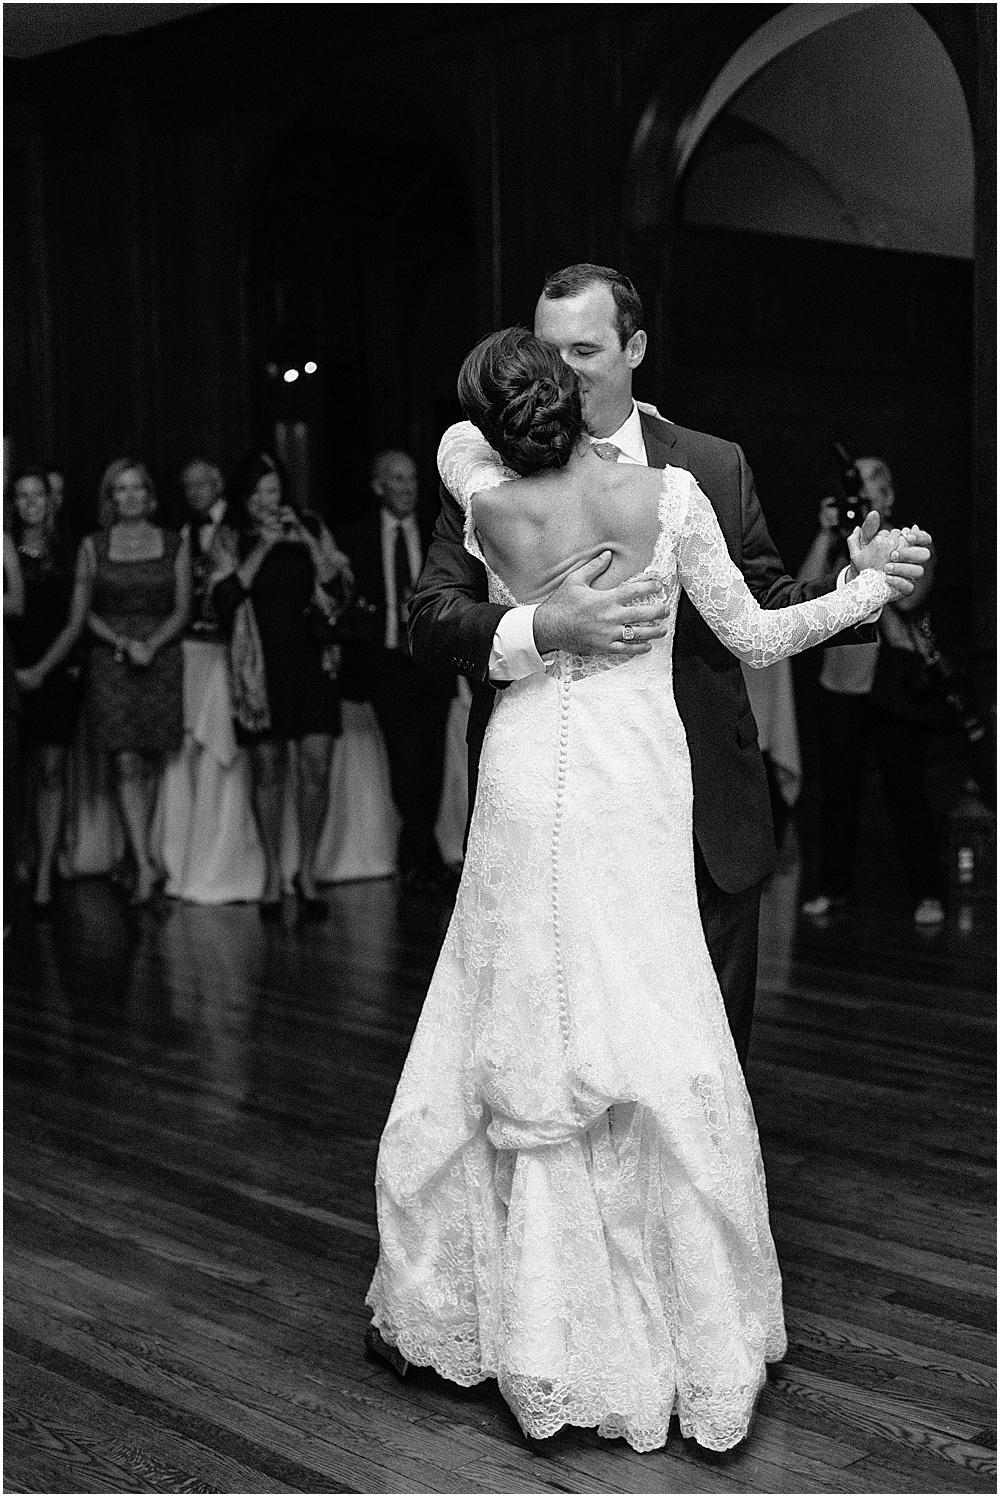 Vane_Baltimore_Country_Club_Wedding_Baltimore_Wedding_Photographer_0188